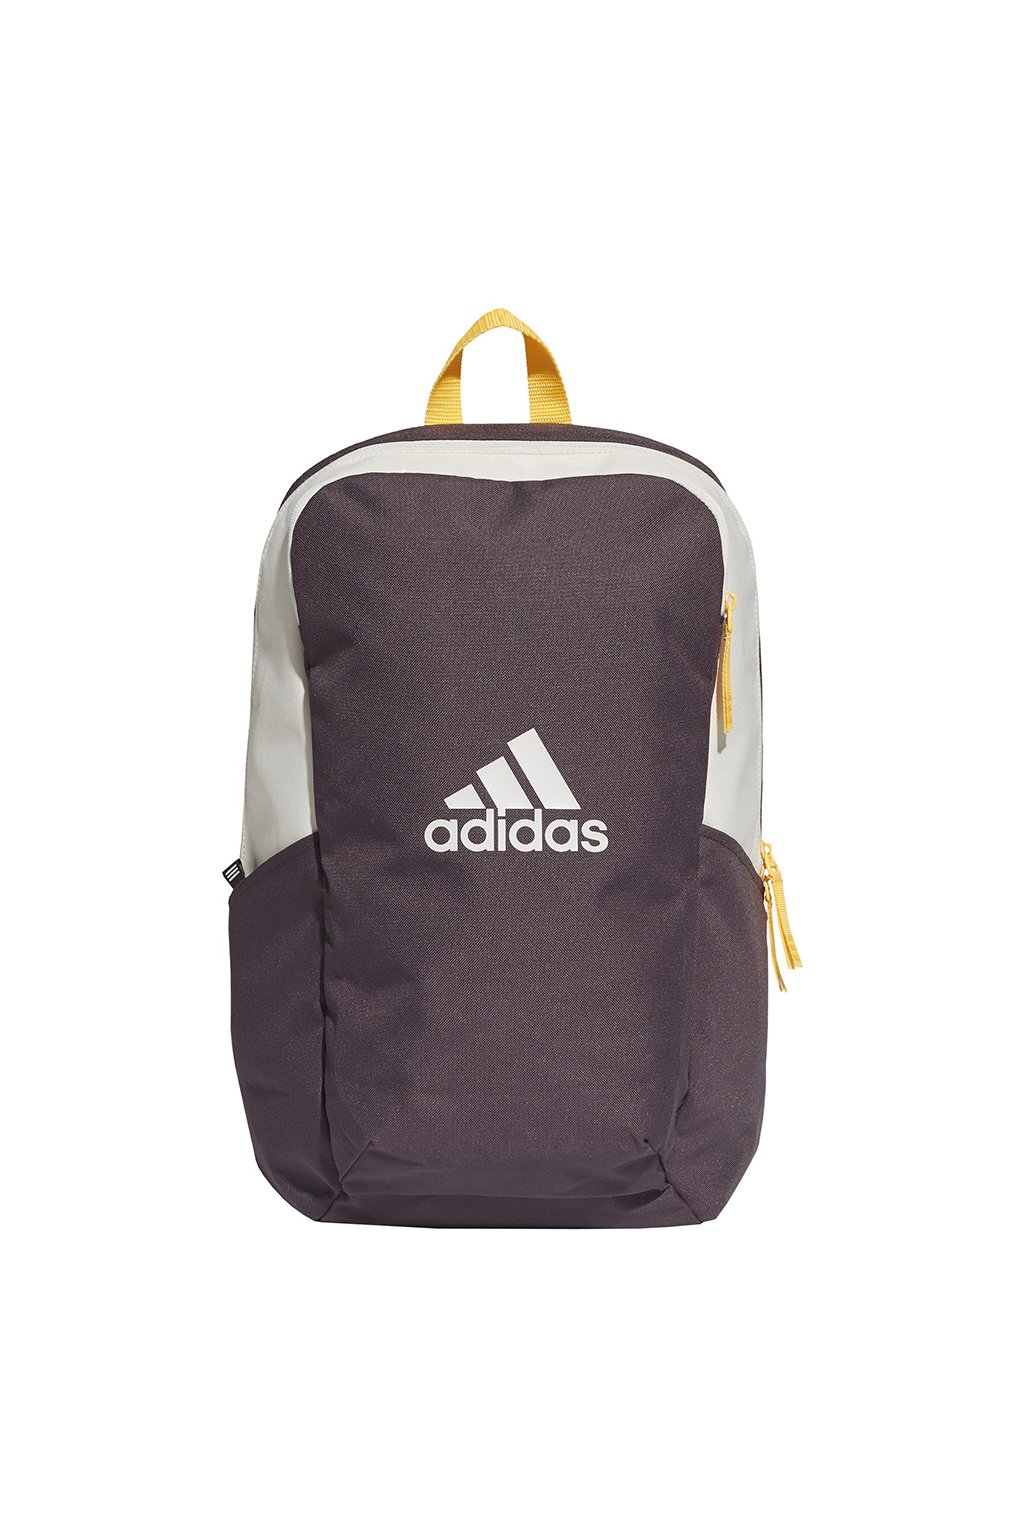 Batoh adidas Parkhood šedý FS0275